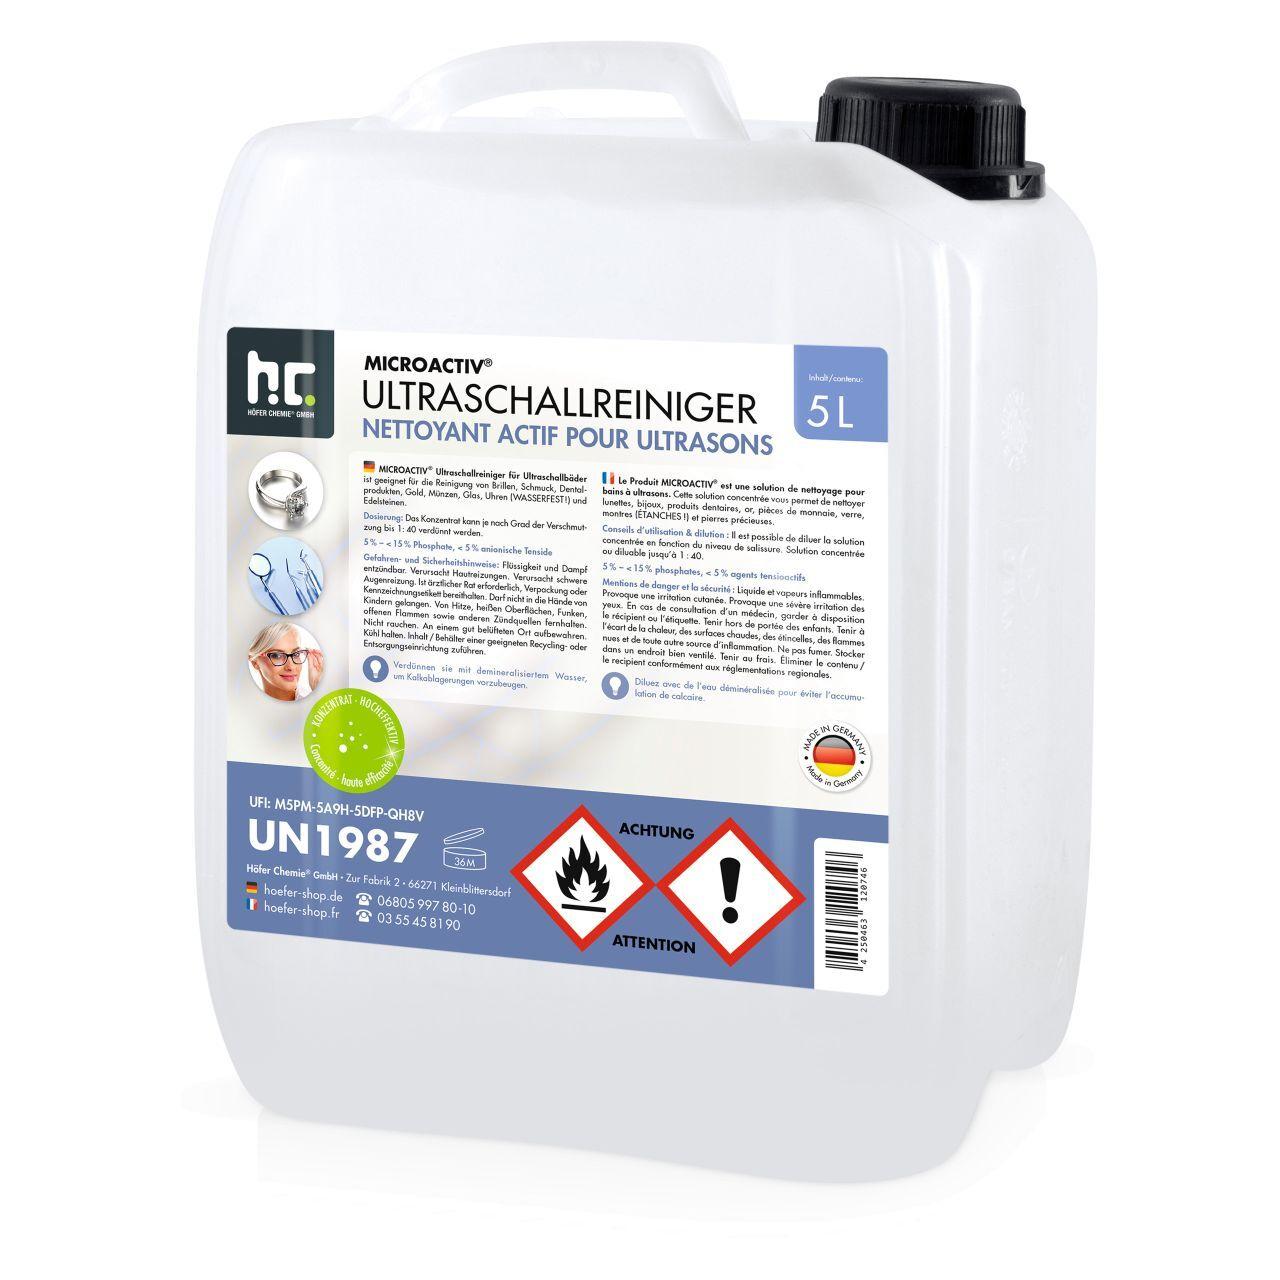 Höfer Chemie 10 l Microactiv® Produit detergent ultrason (2 x 5 l)